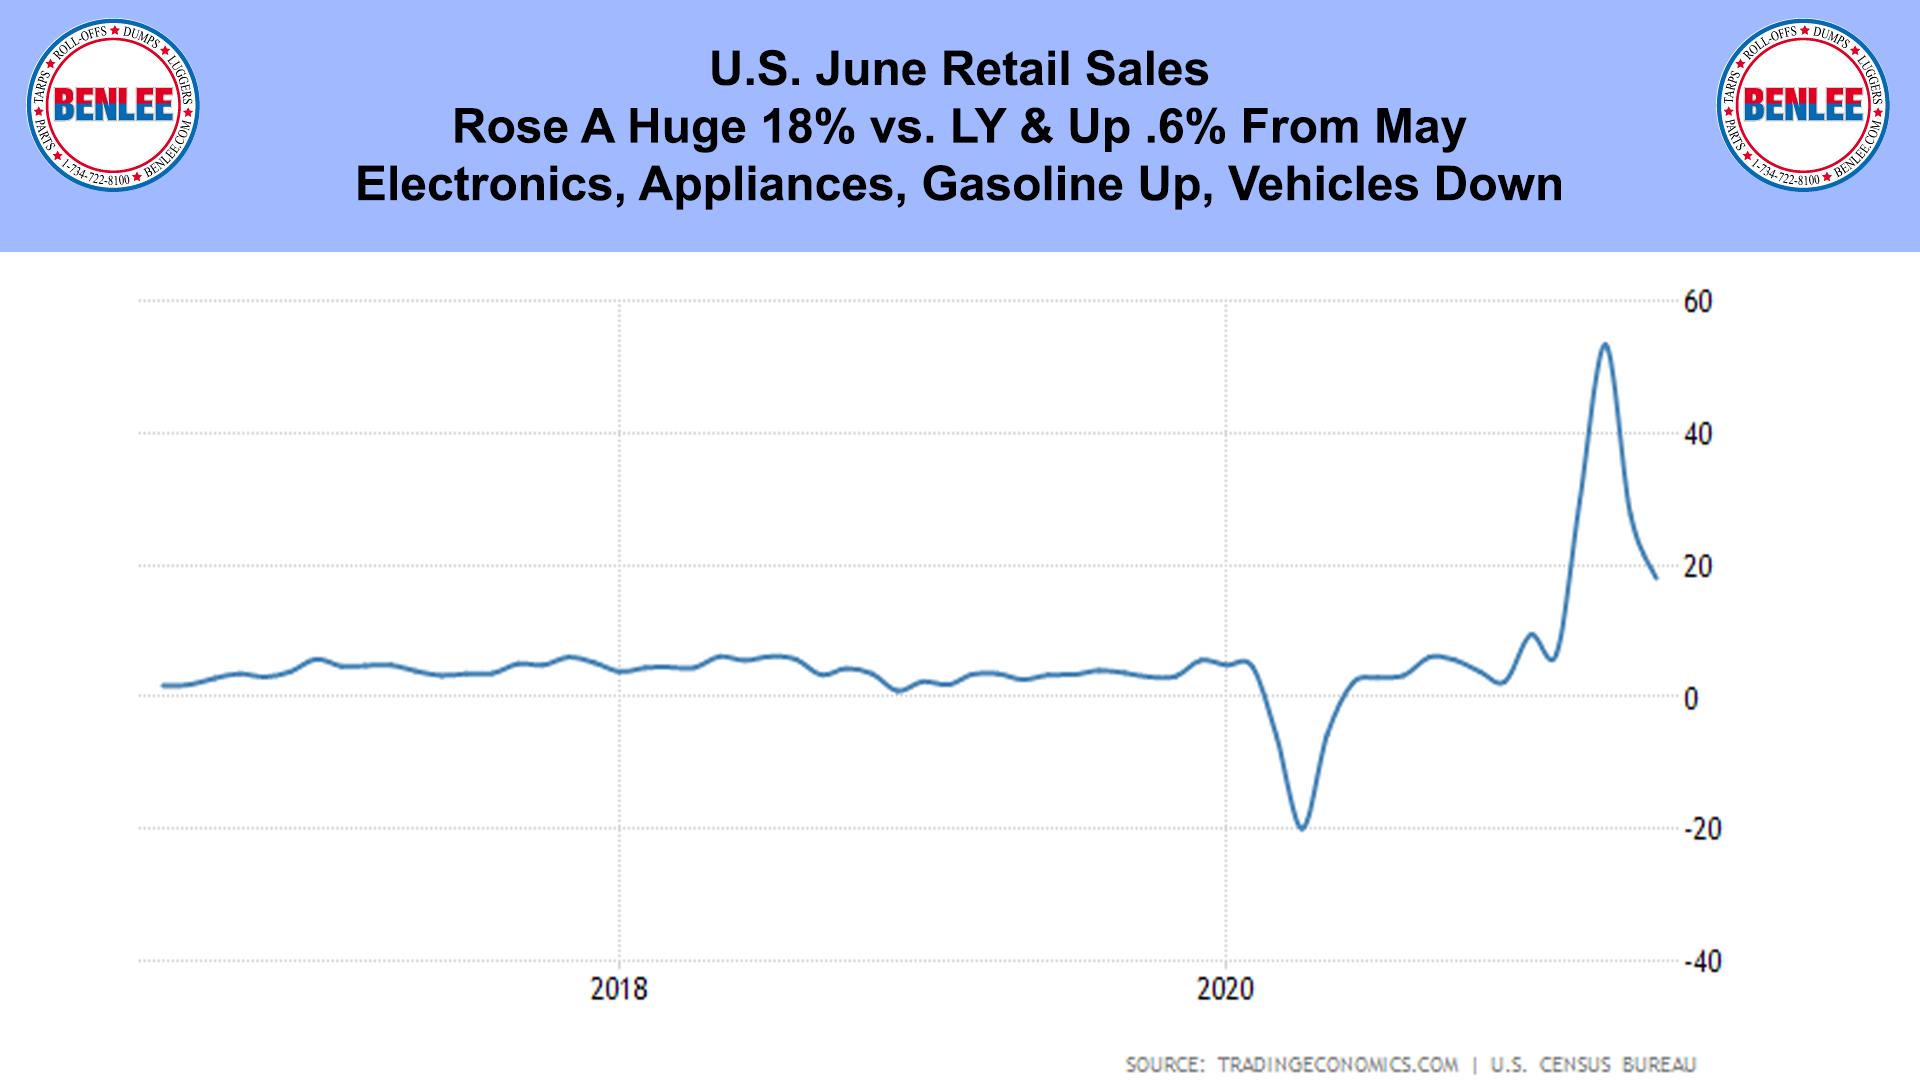 U.S. June Retail Sales